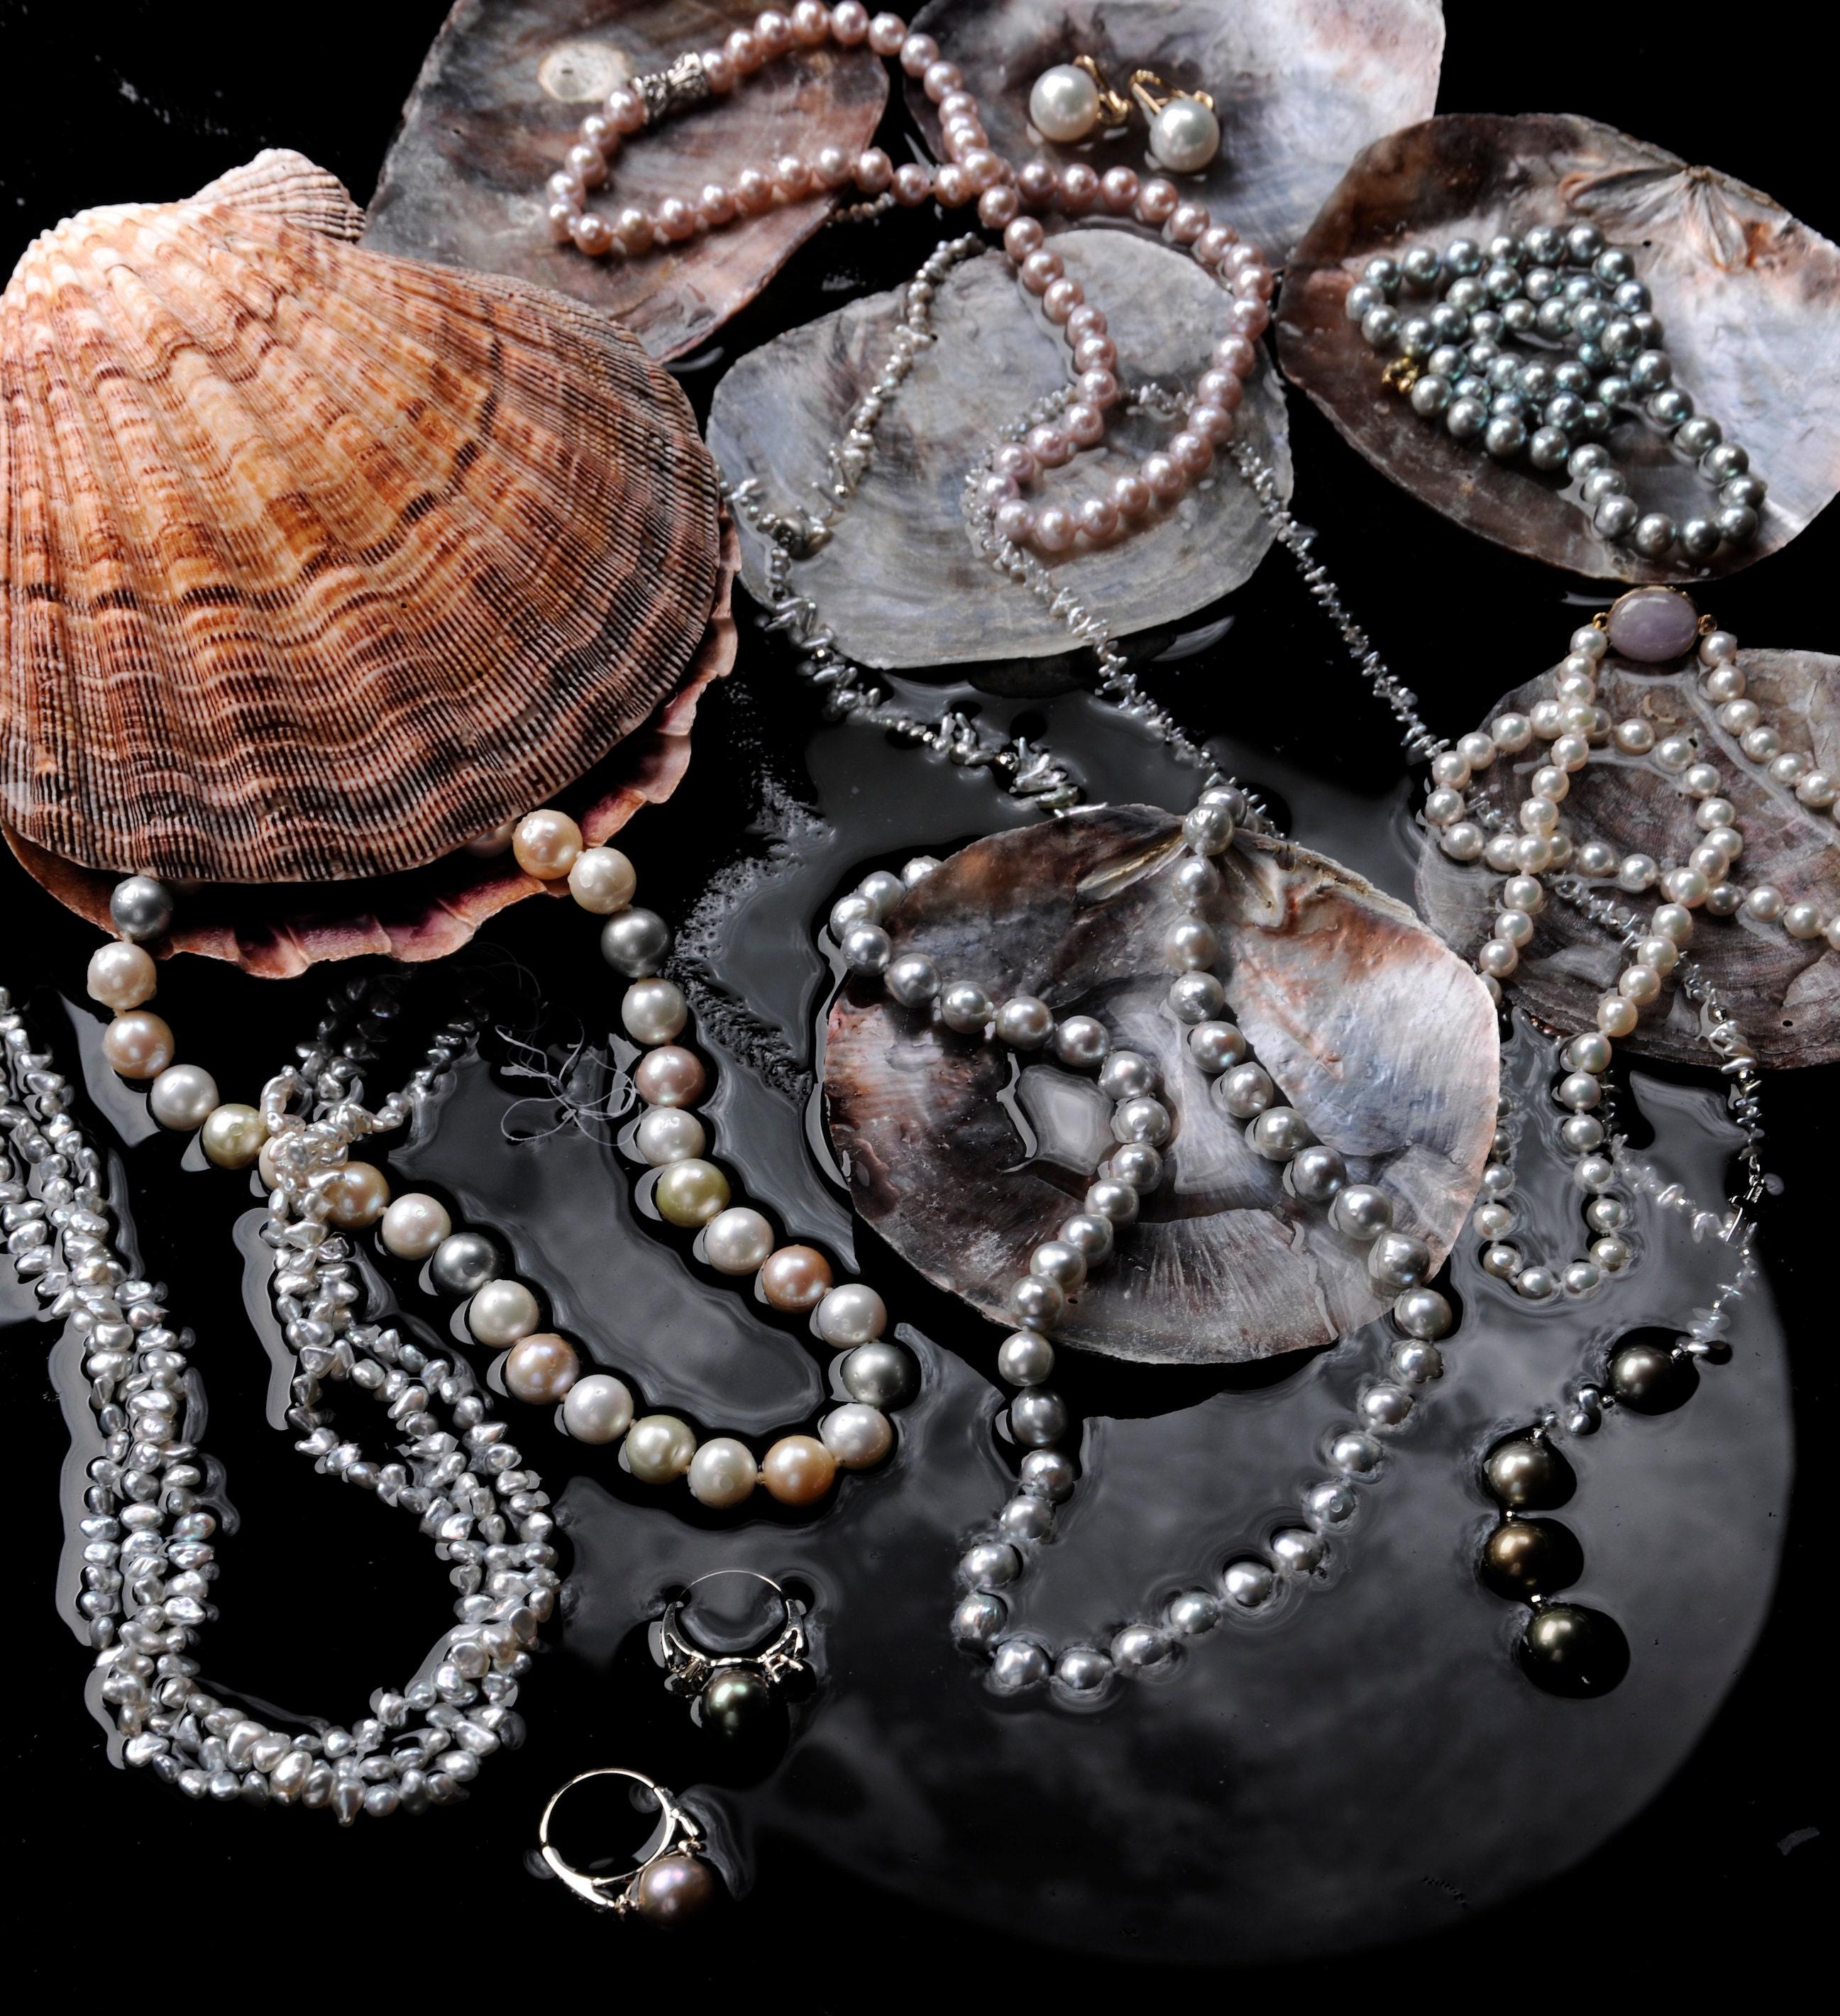 Tahitian Pearls, South Sea Pearls, Cultured Pearls